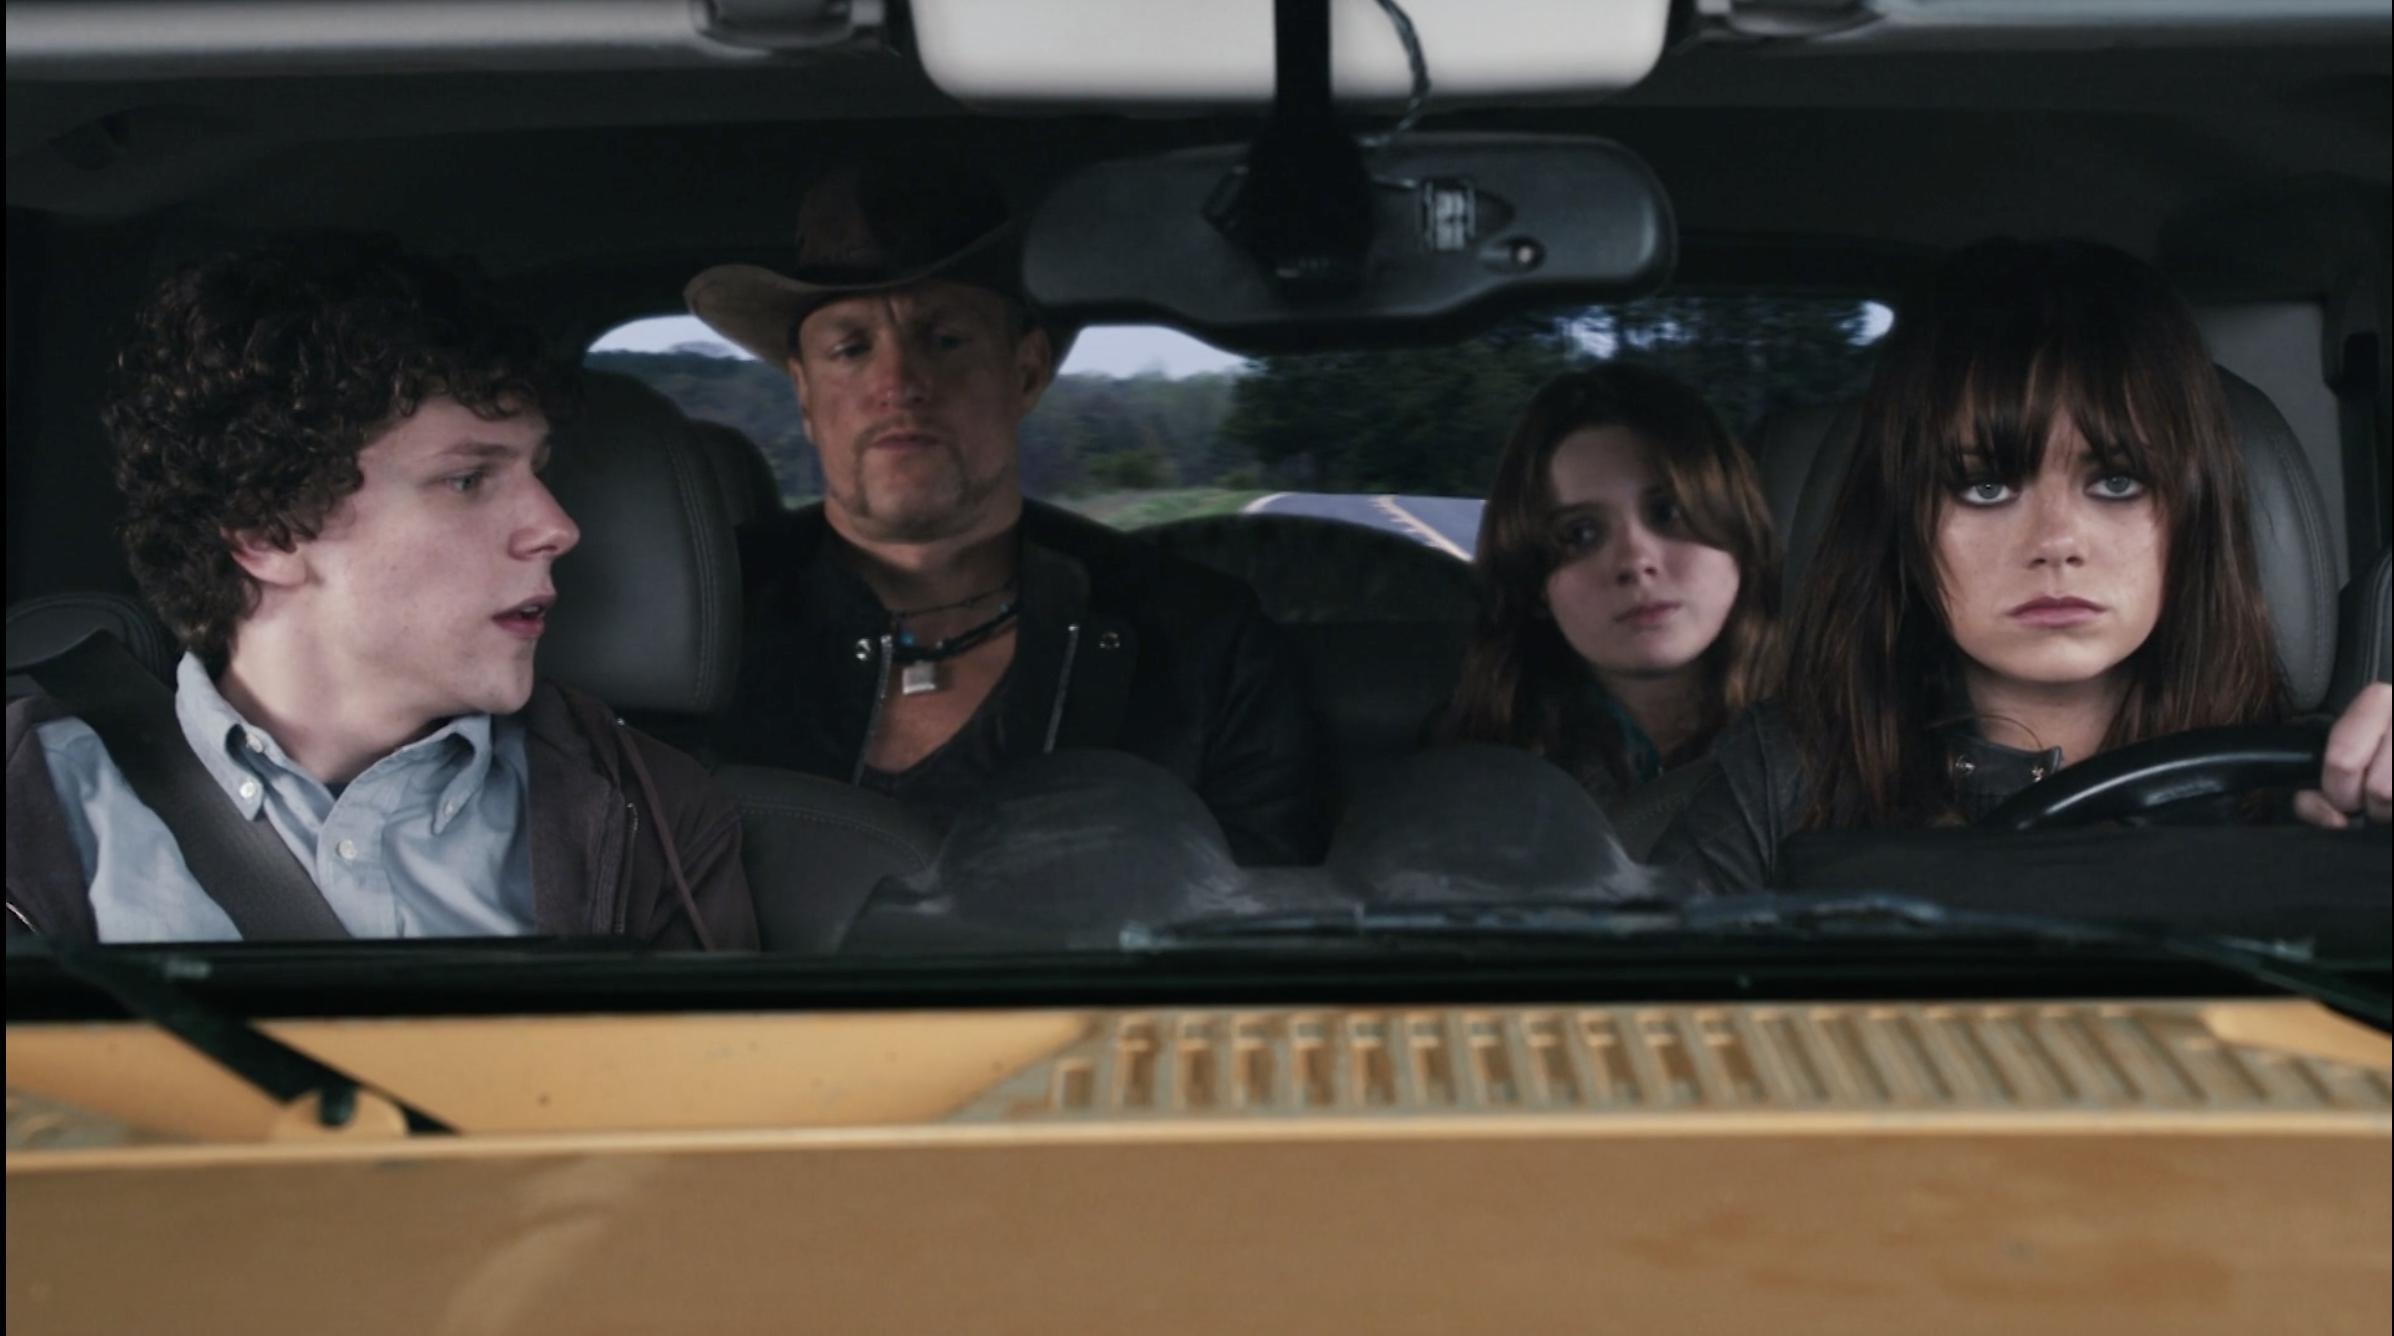 Jesse Eisenberg, Woody Harrelson, Abigail Breslin, and Emma Stone in Zombieland